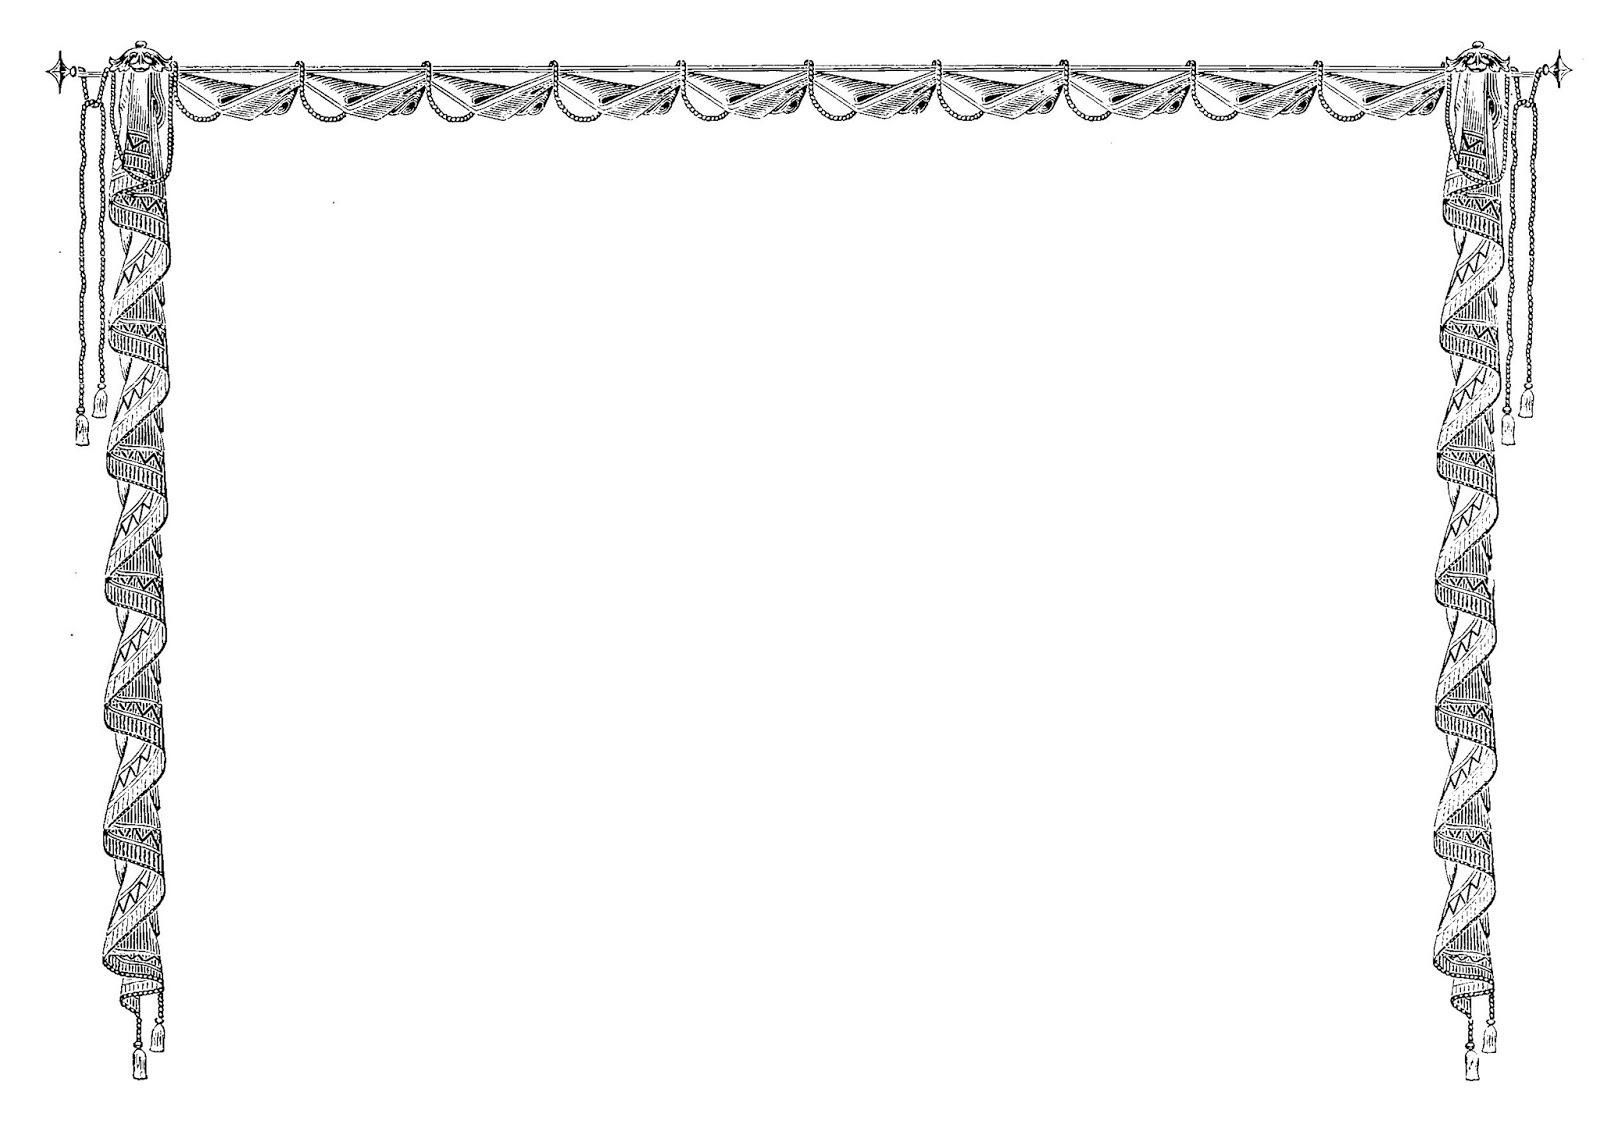 Decorative Page Borders Design | Vectorborders - Free Printable Page Borders